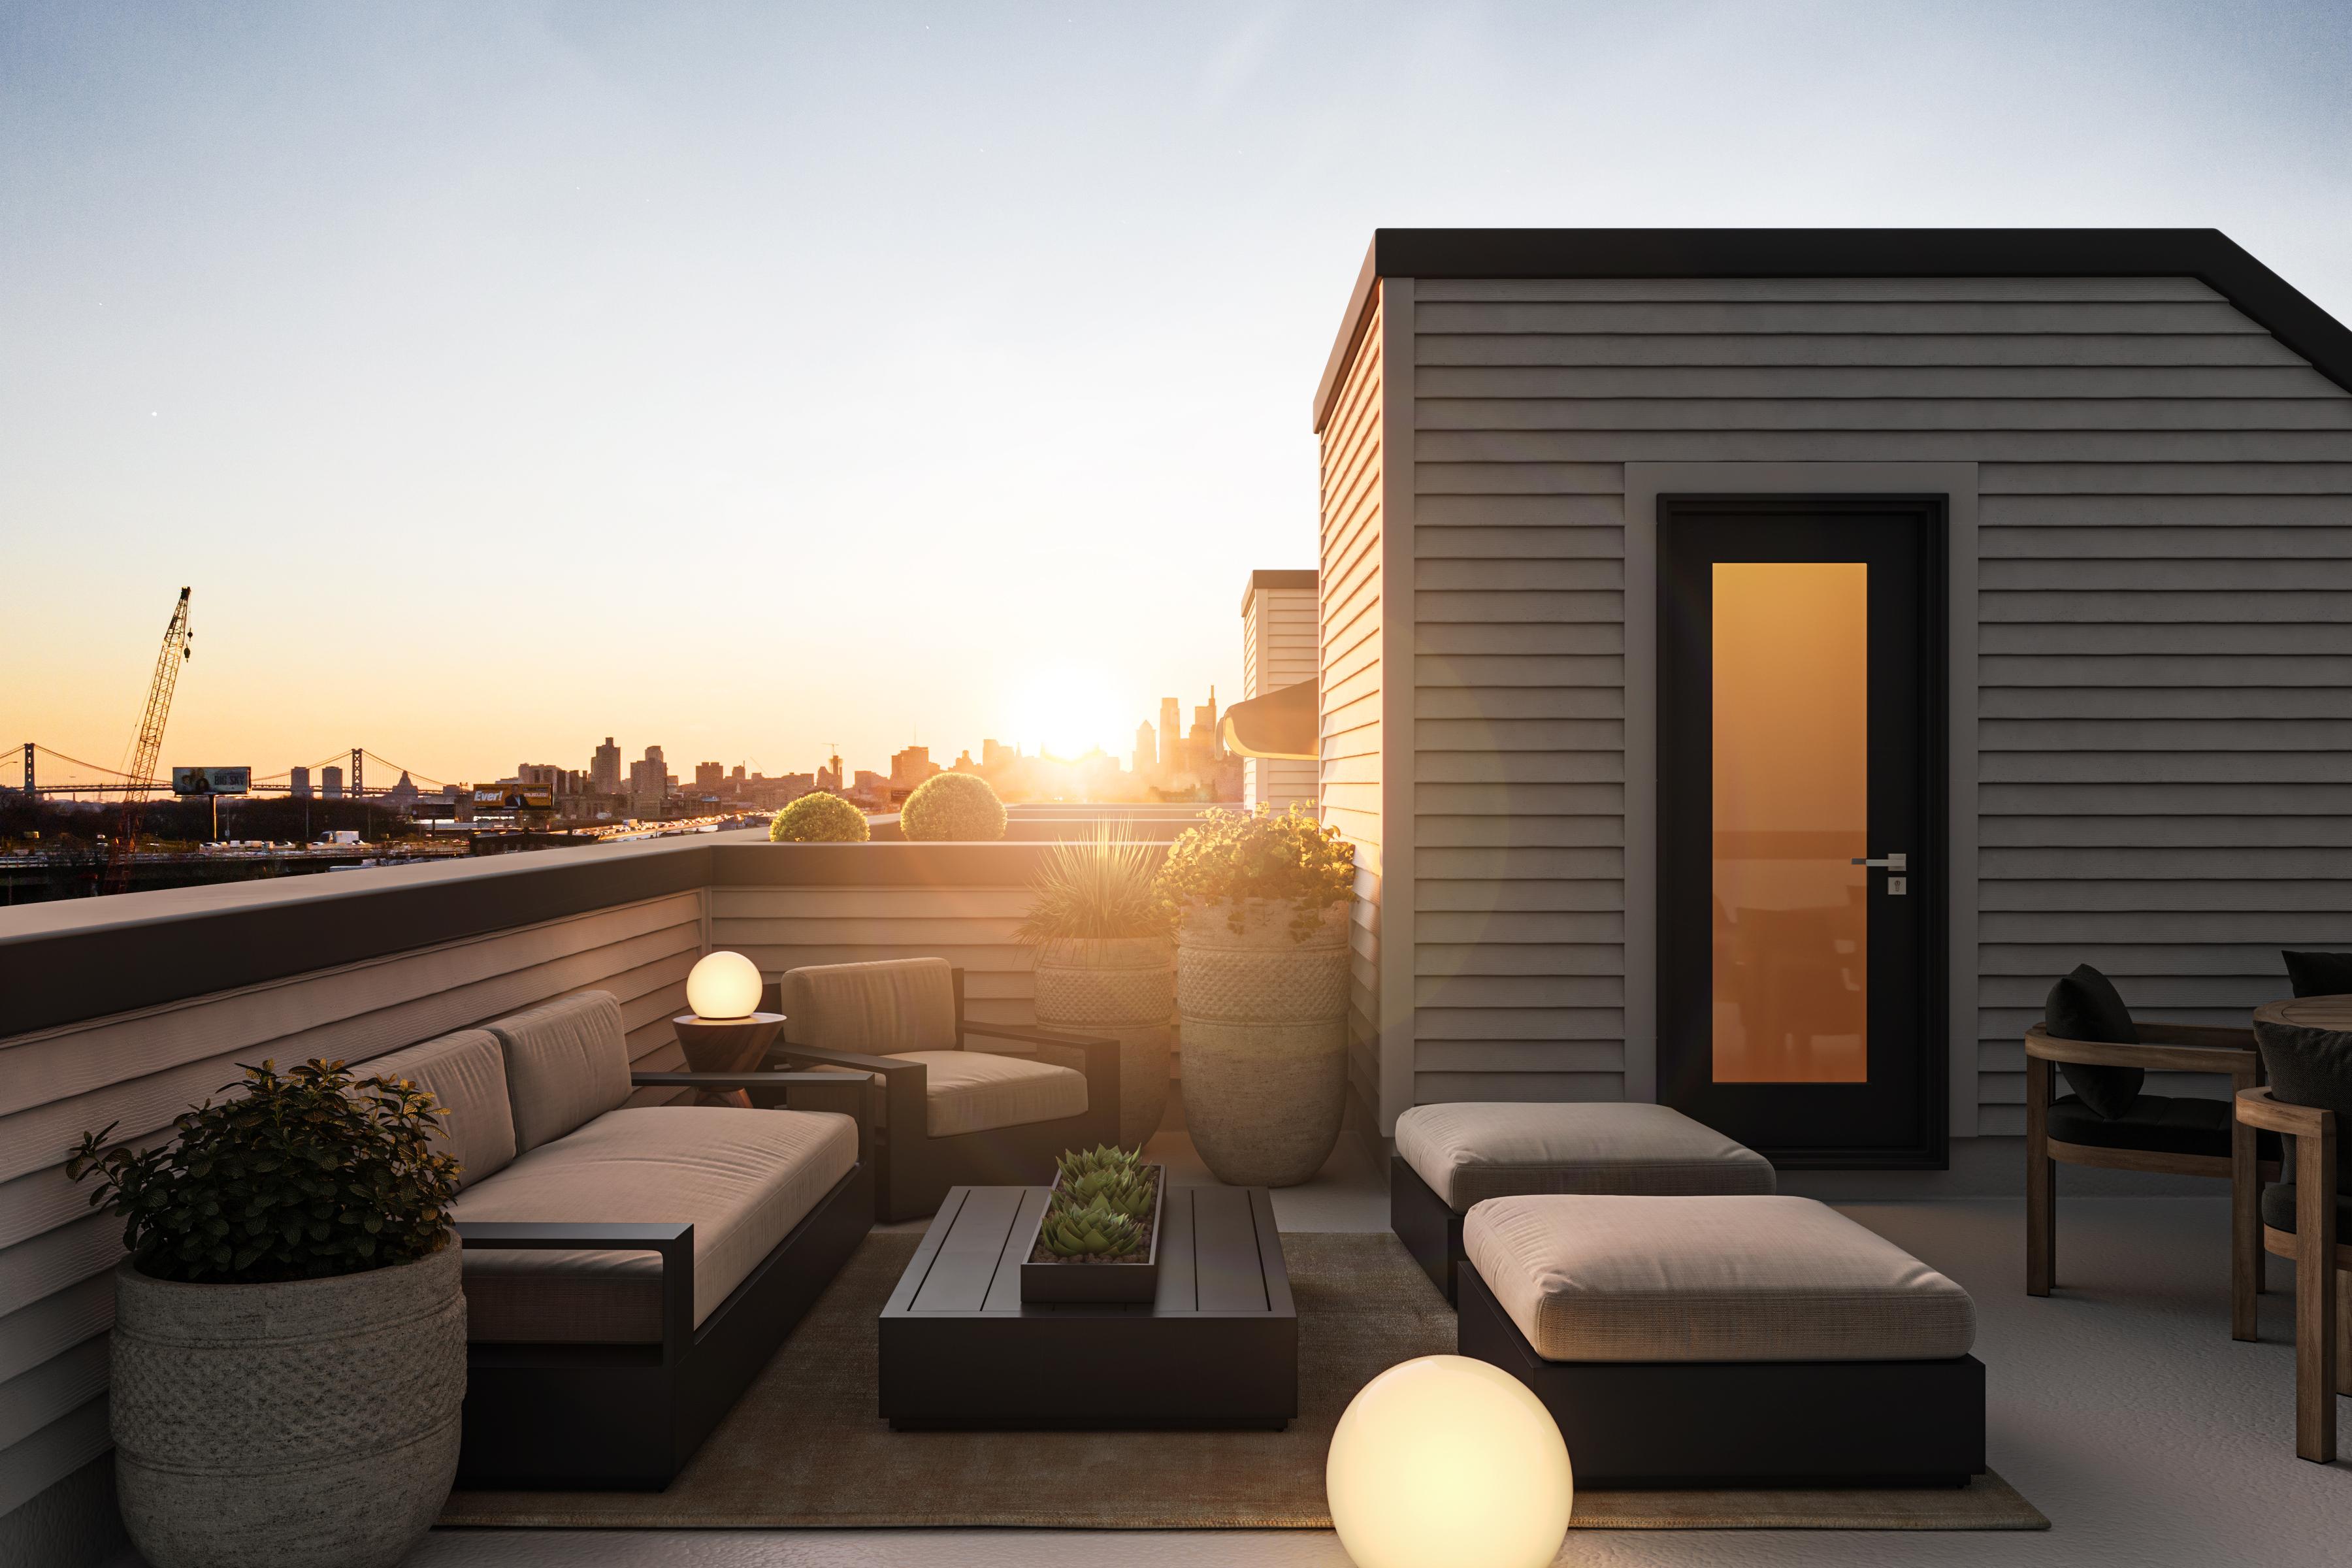 Roof Deck Rendering